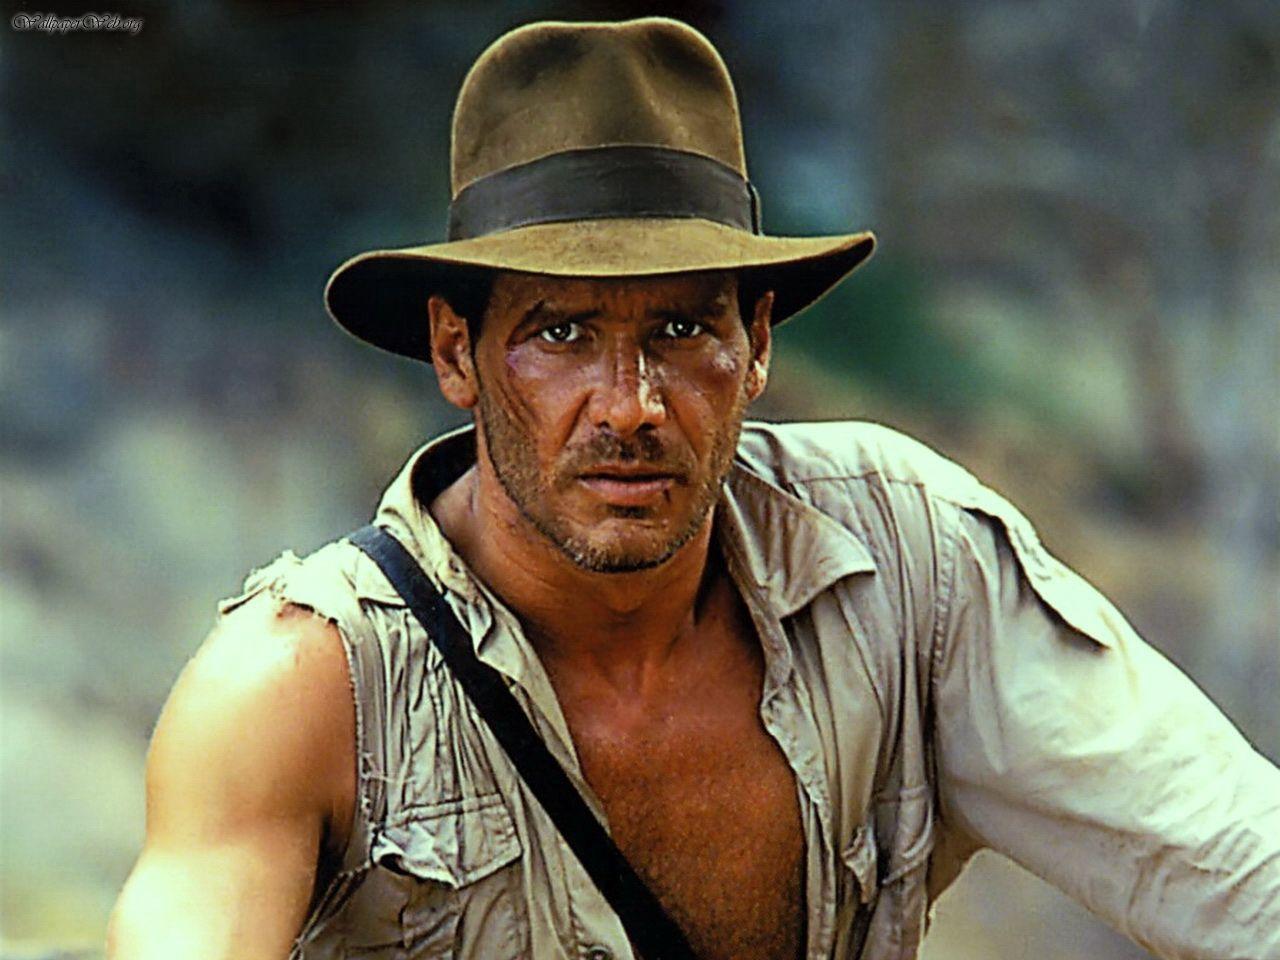 Lookinu0027 mighty fine Dr. Jones. Mighty fine.  sc 1 st  See Rebecca Sew & See Rebecca Sew: Halloween 2011: Indiana Jones Costume Ideas